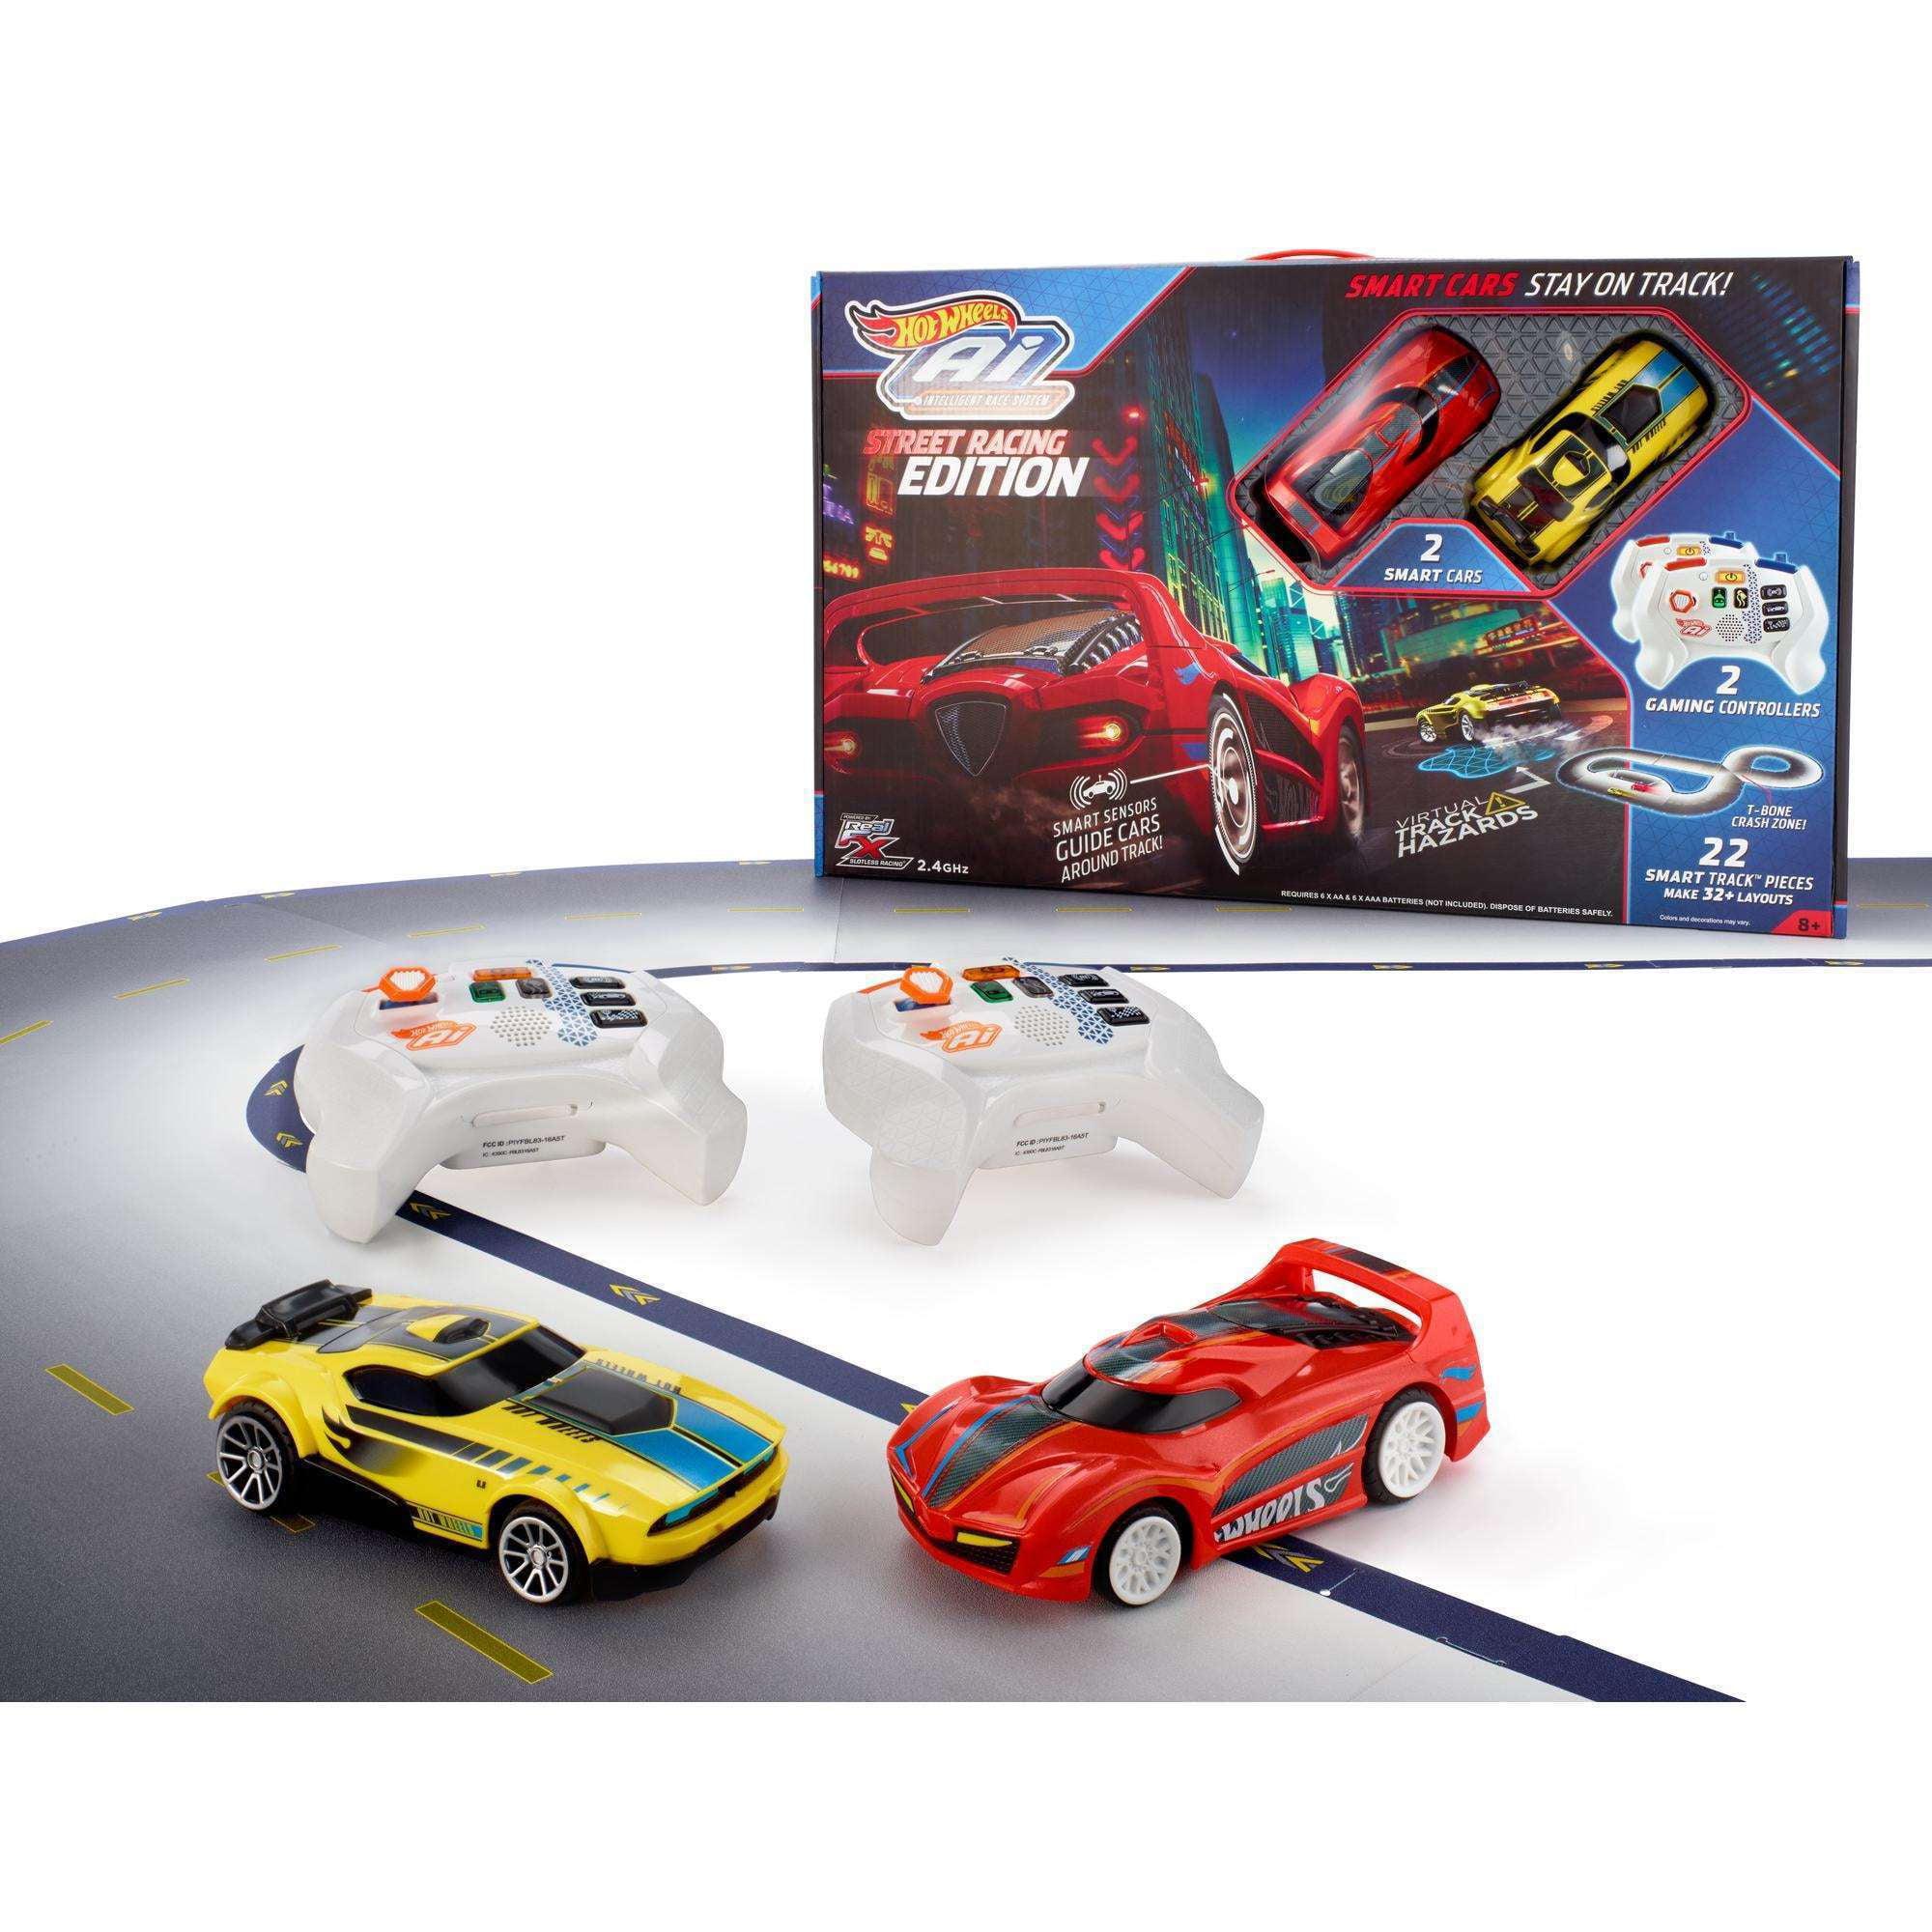 Hot Wheels Ai Starter Set Street Racing Edition Track Set by Mattel